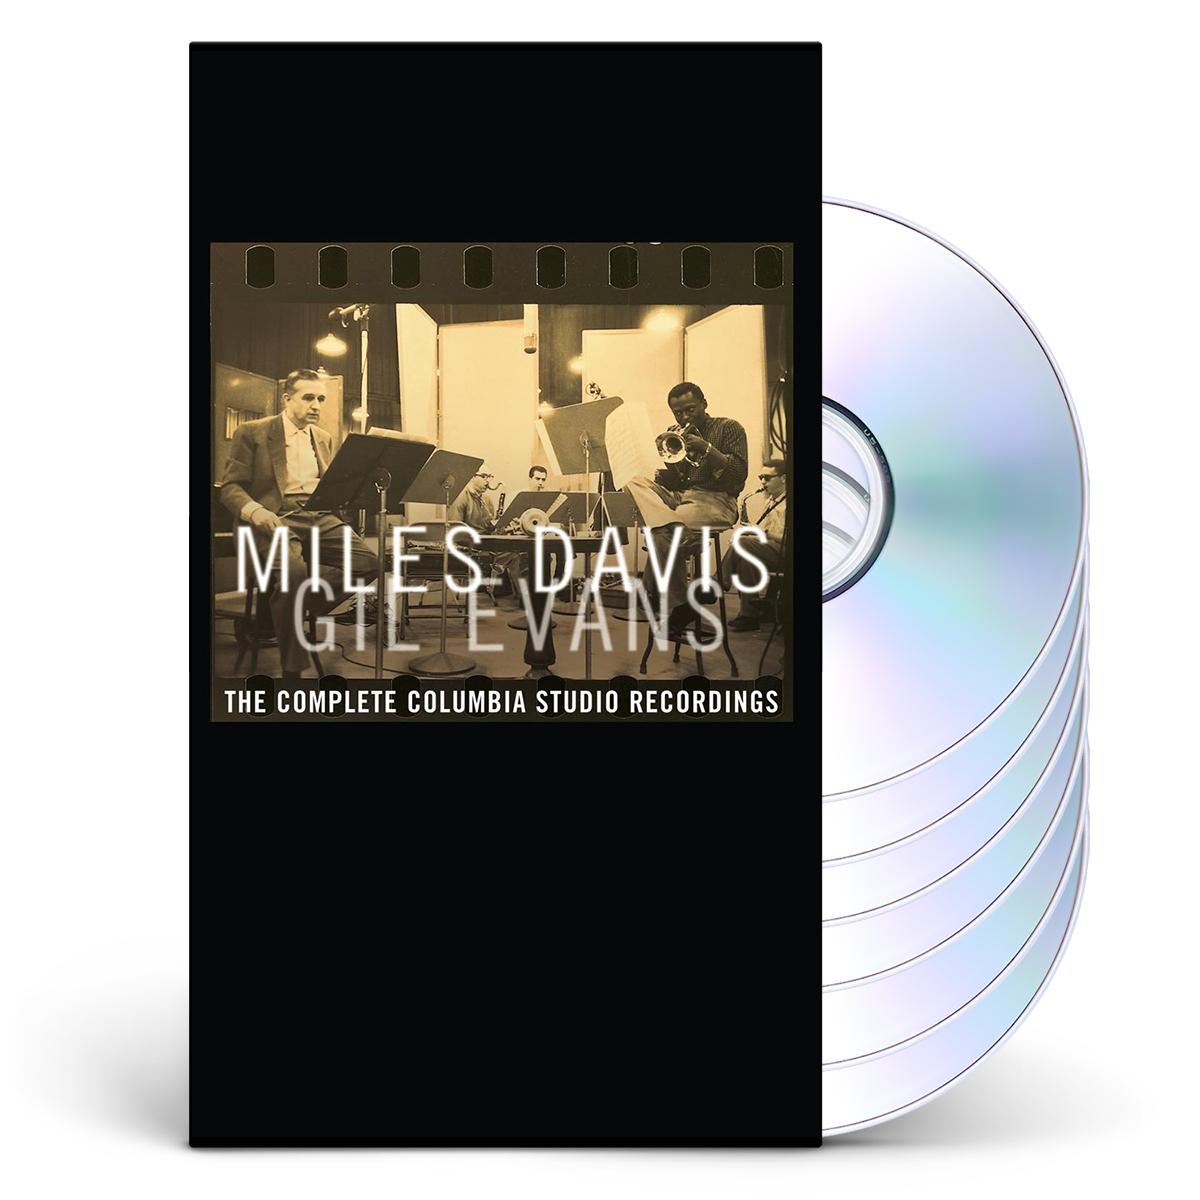 Miles Davis The Complete Columbia Studio Recordings 6-disc CD